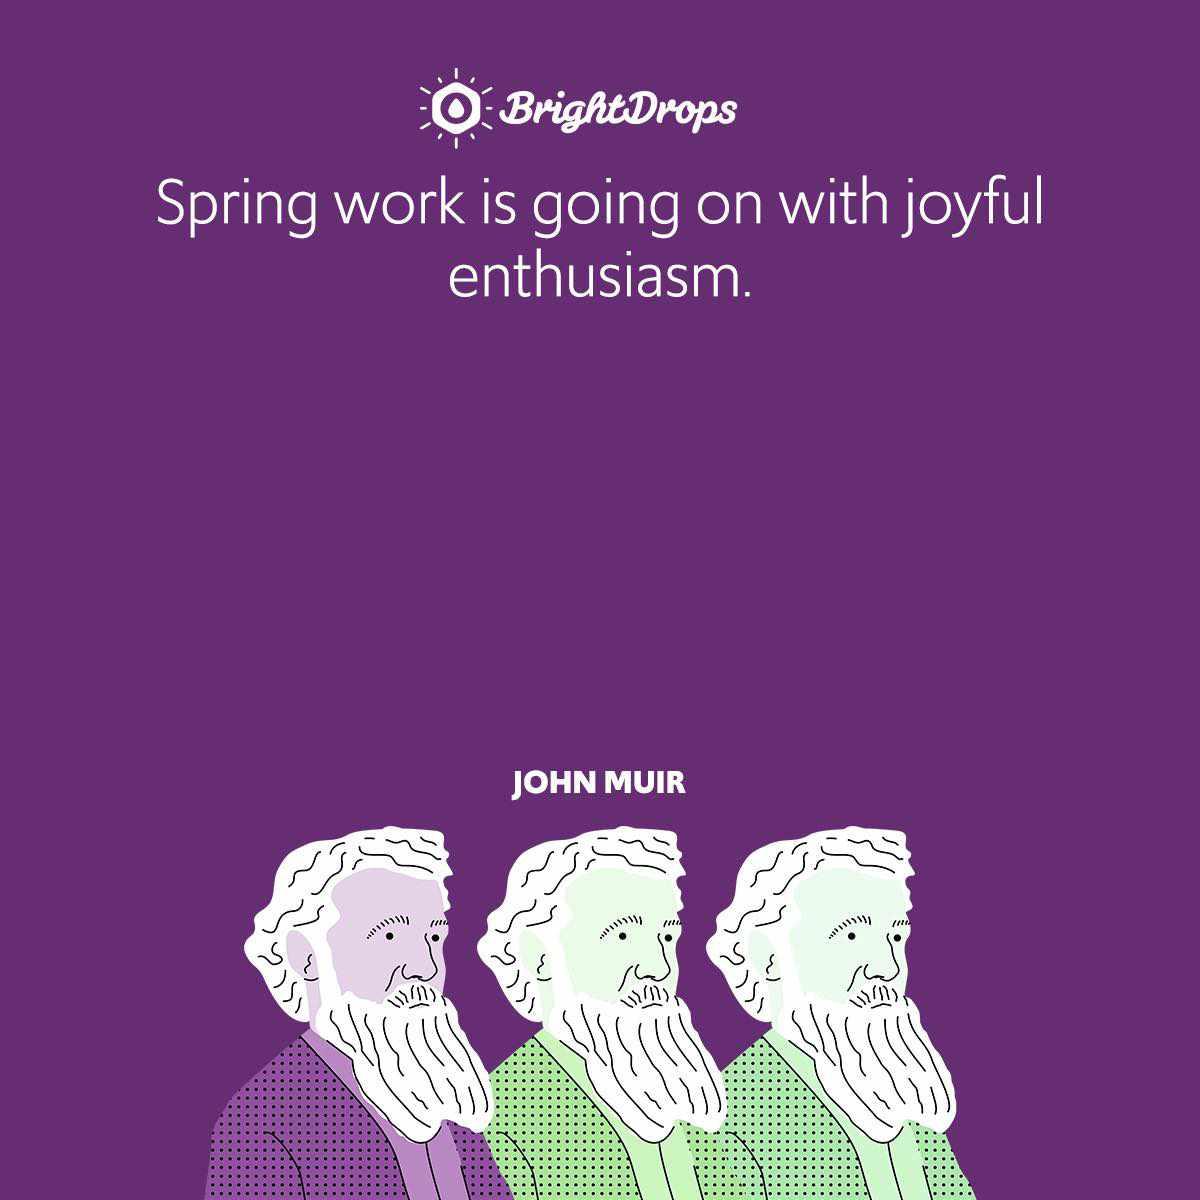 Spring work is going on with joyful enthusiasm.